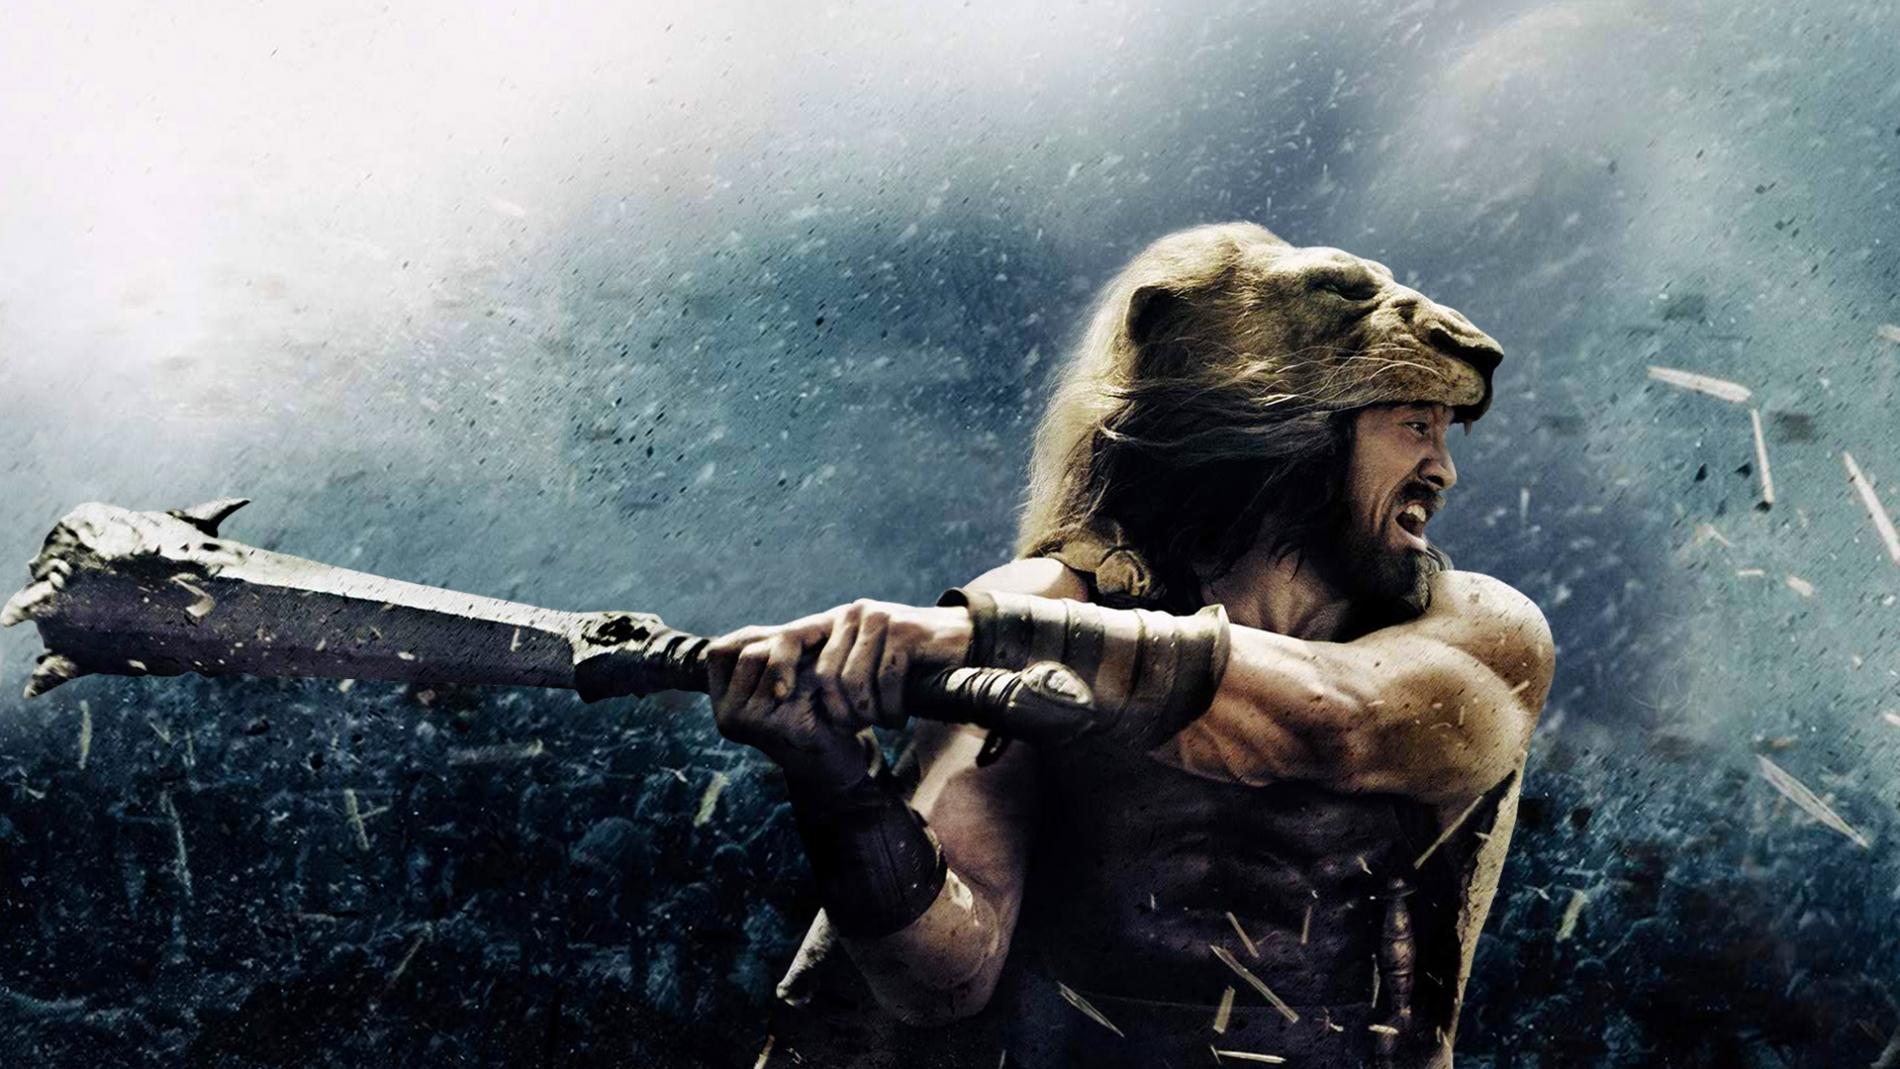 Hercules Retina Movie Wallpaper: Hercules Wallpapers High Quality